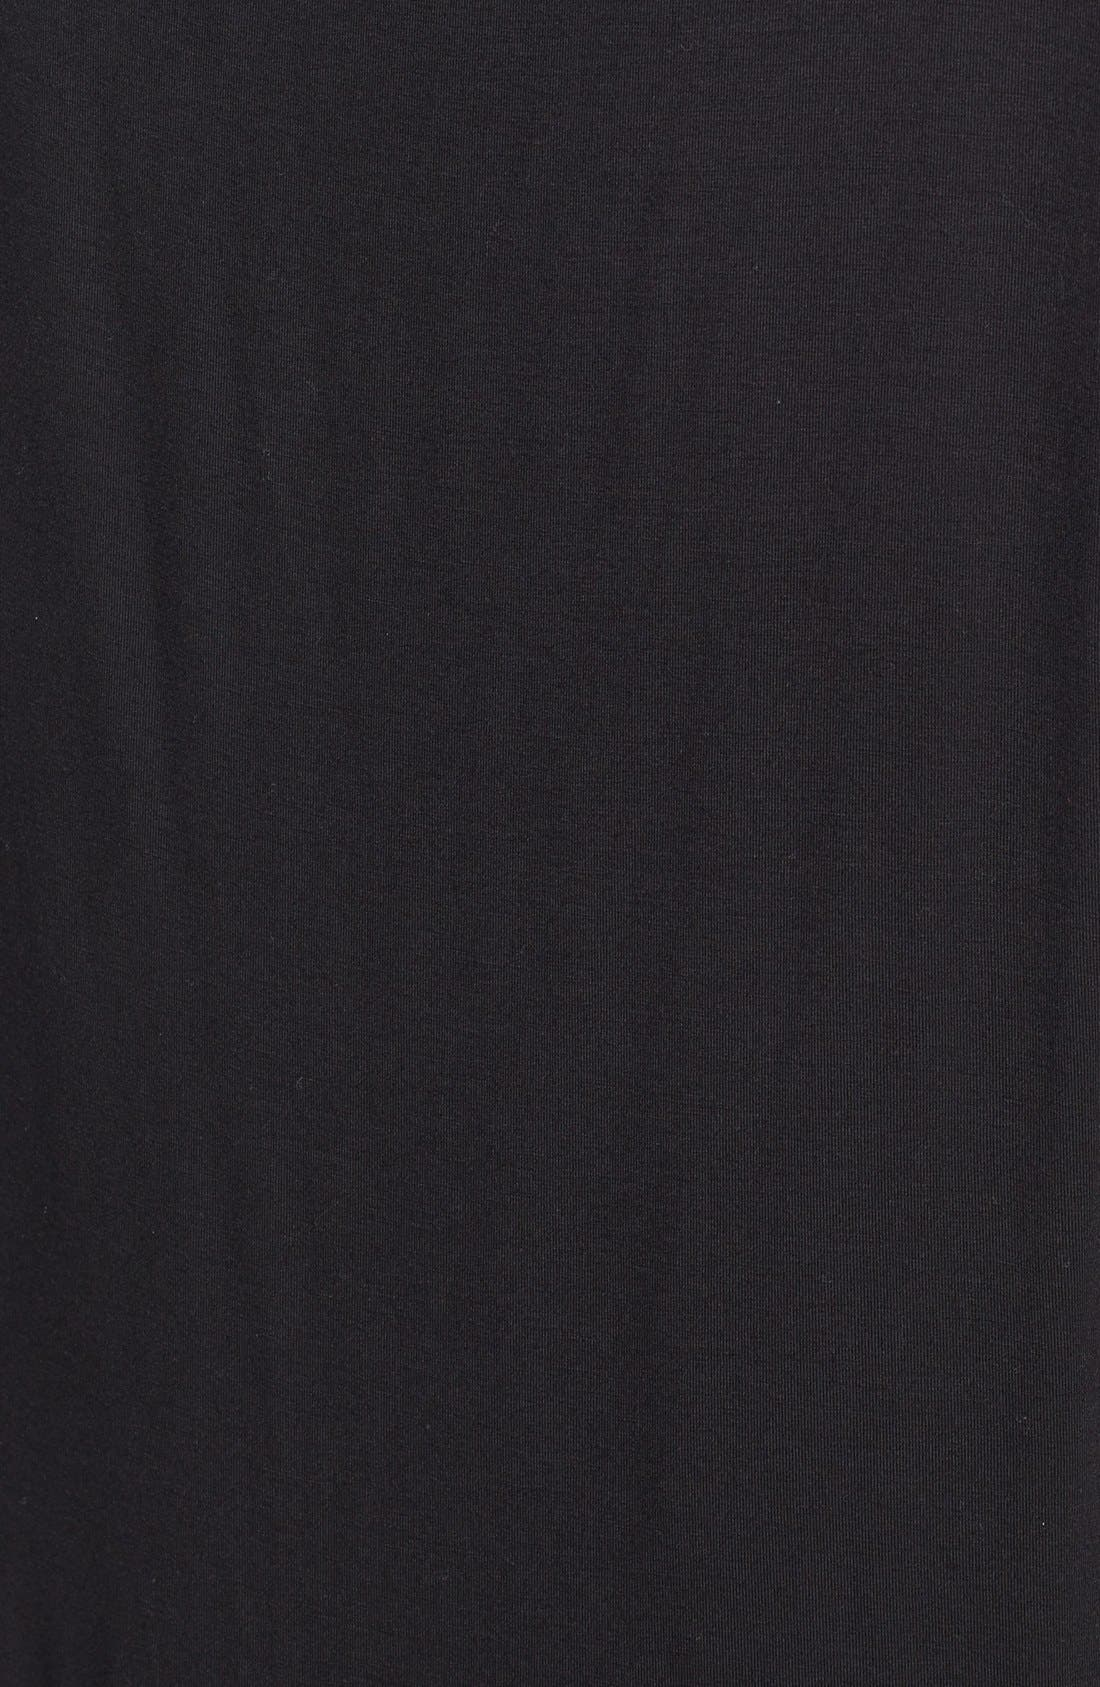 Alternate Image 3  - Bailey 44 'Black Hole' Jersey & Leather Dress